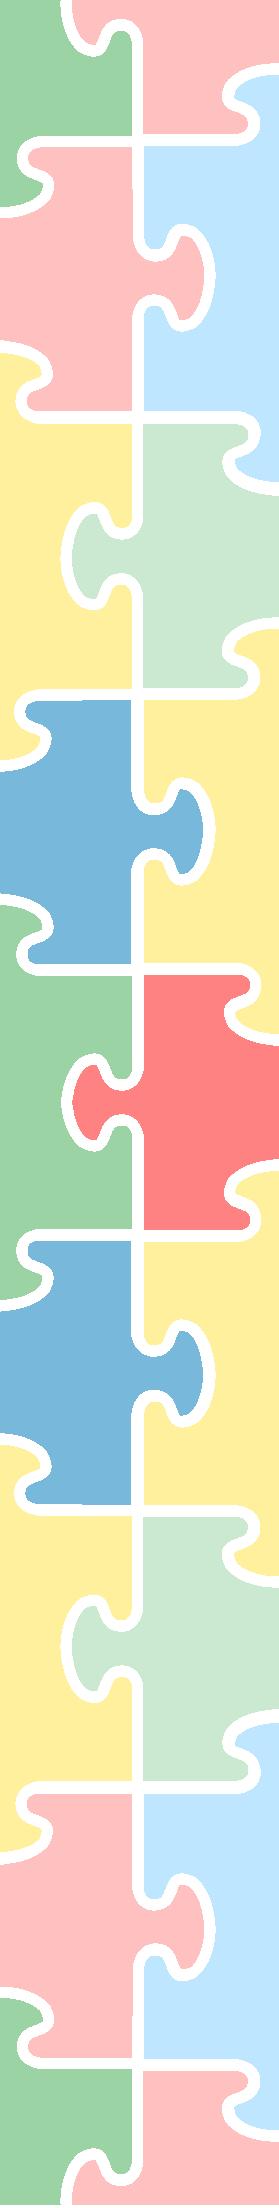 jigsaw strip.png